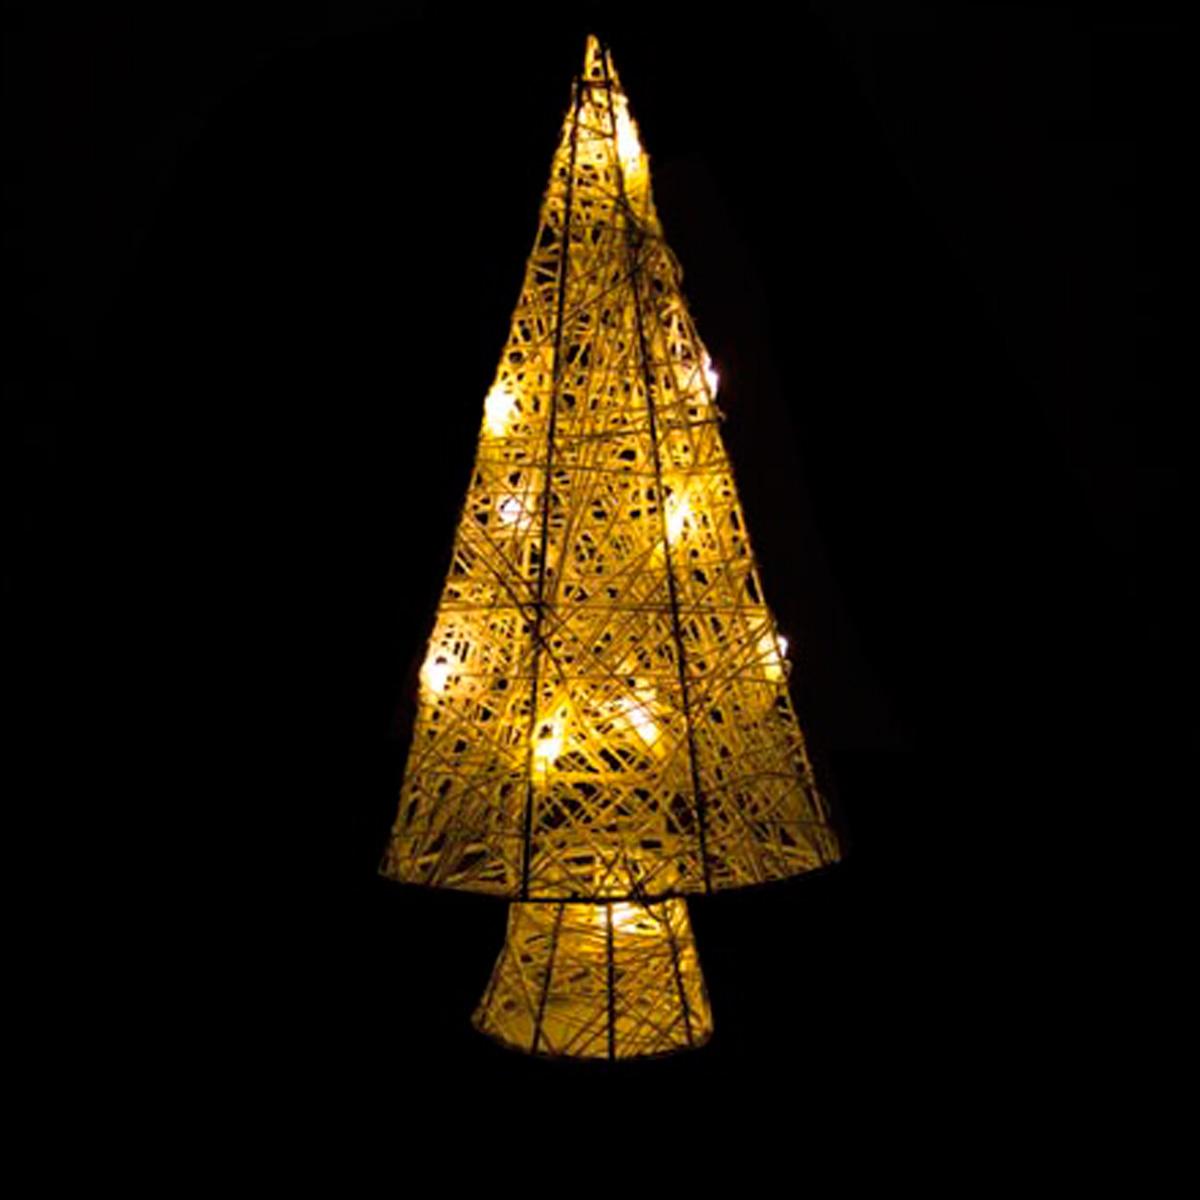 Arbol de navidad led color blanco calido - Arbol navidad led ...